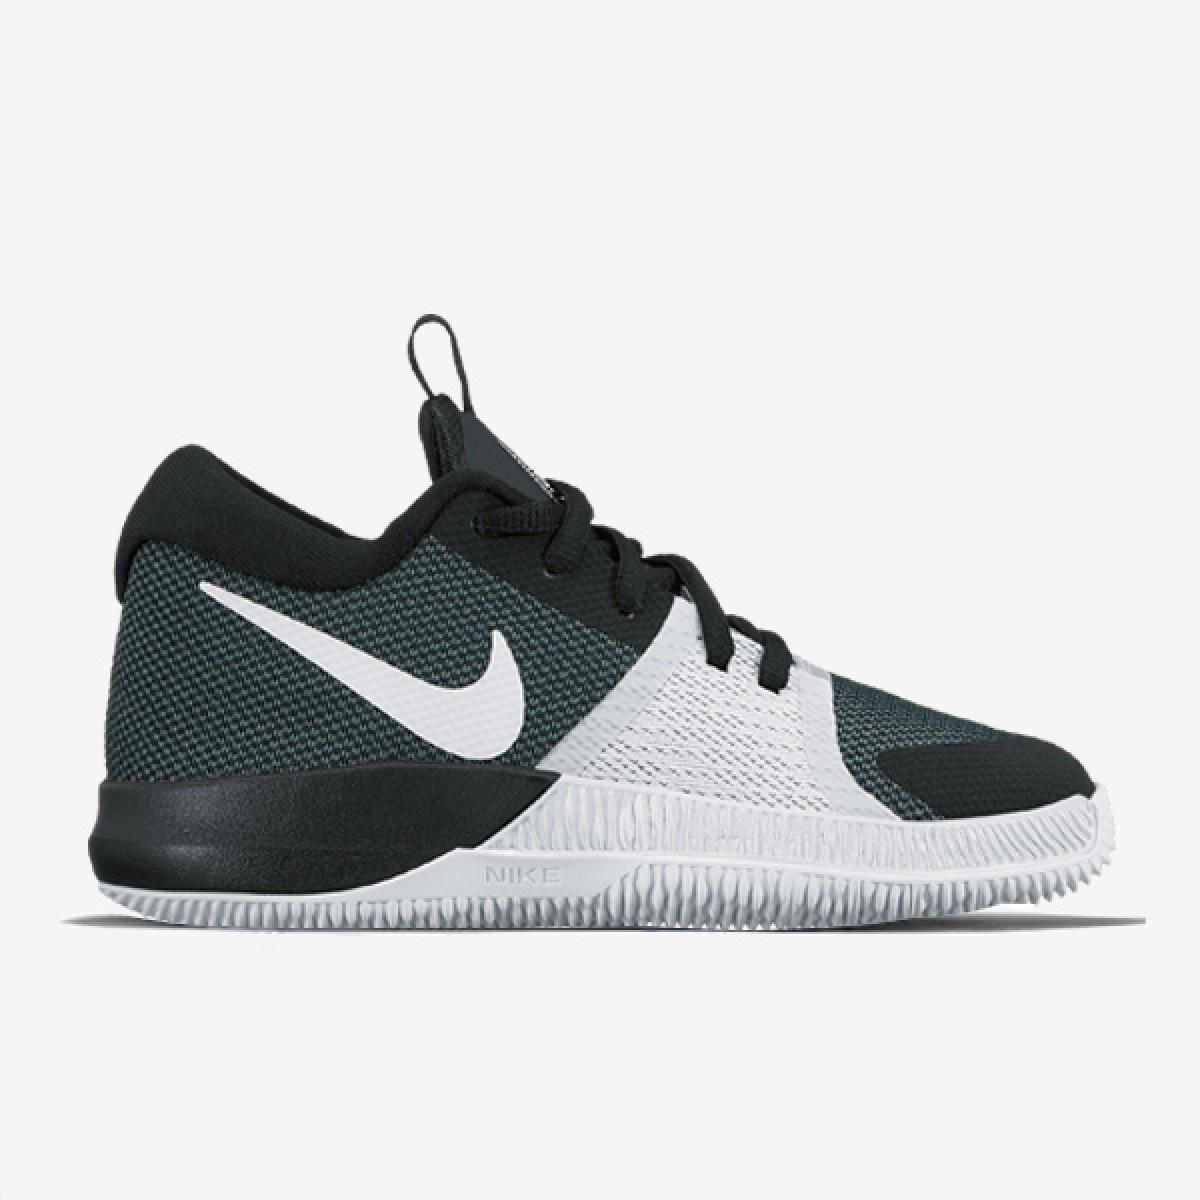 Nike Zoom Assersion GS 'B&W'